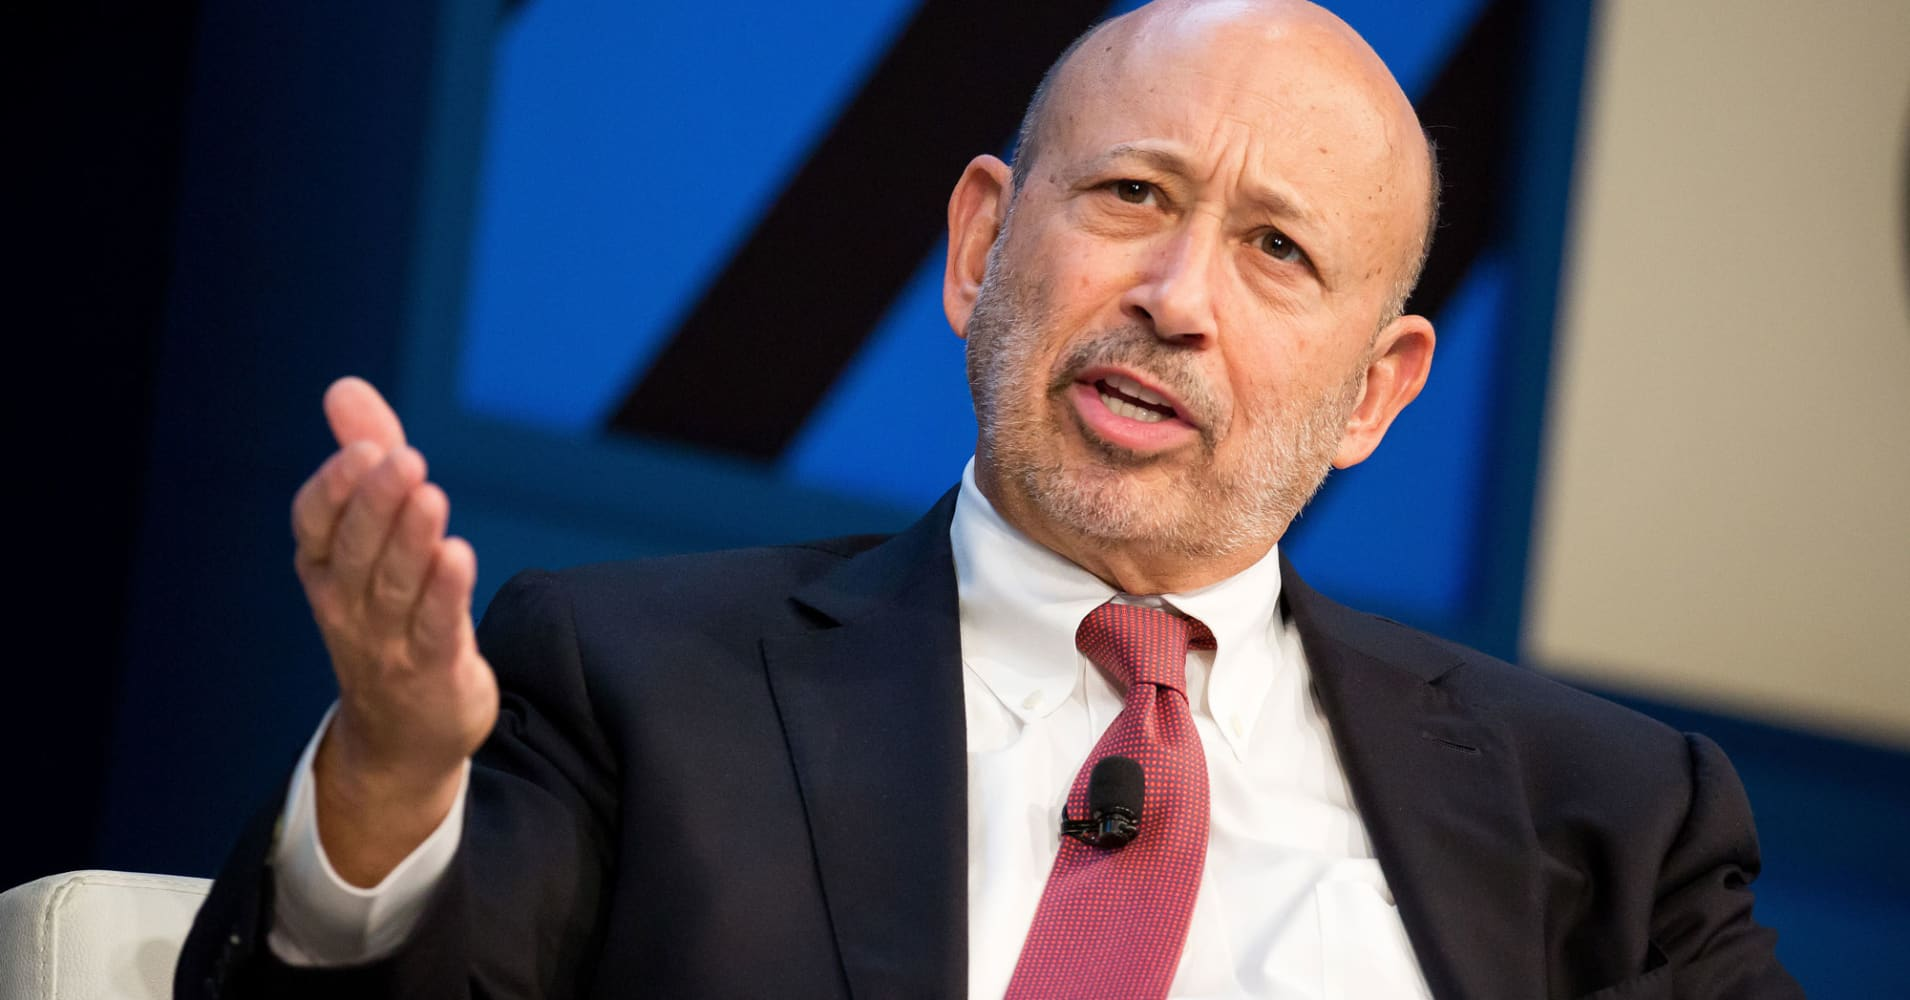 Lloyd Blankfein hits back at senators over stock buybacks: 'The money doesn't vanish'